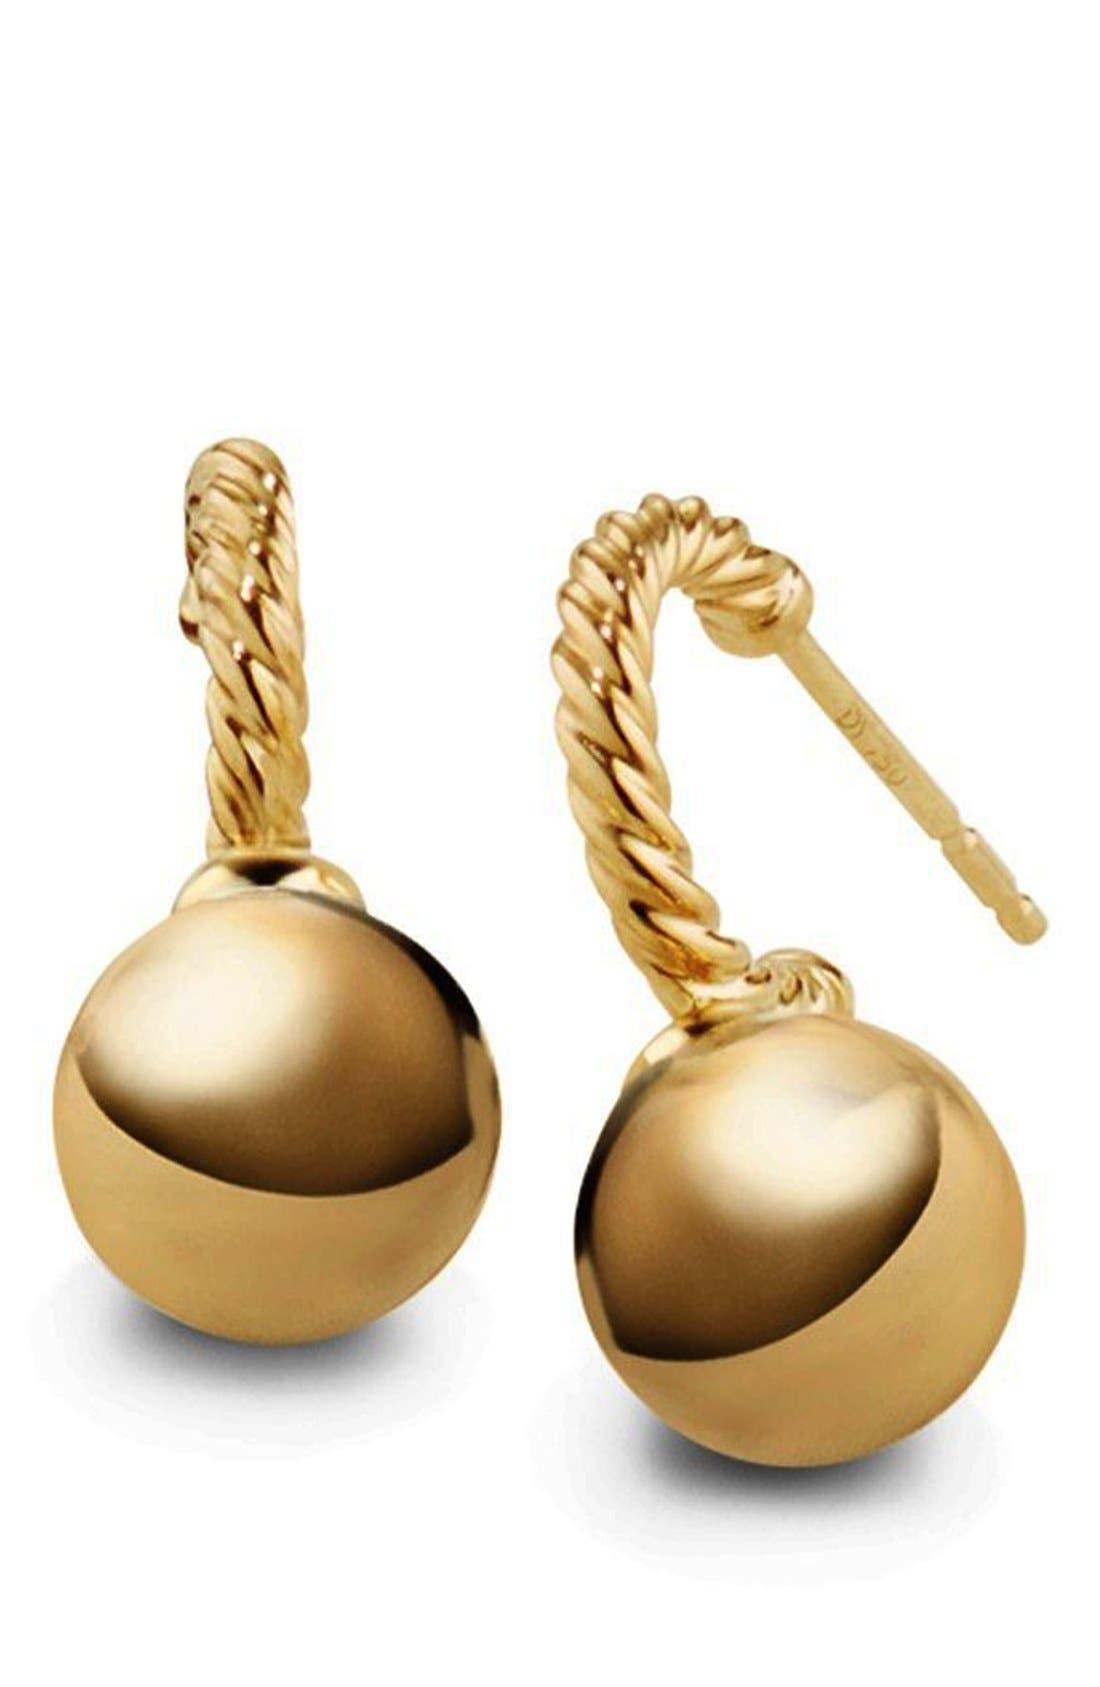 'Solari' Hoop Earrings in 18K Gold,                             Alternate thumbnail 2, color,                             Gold Dome